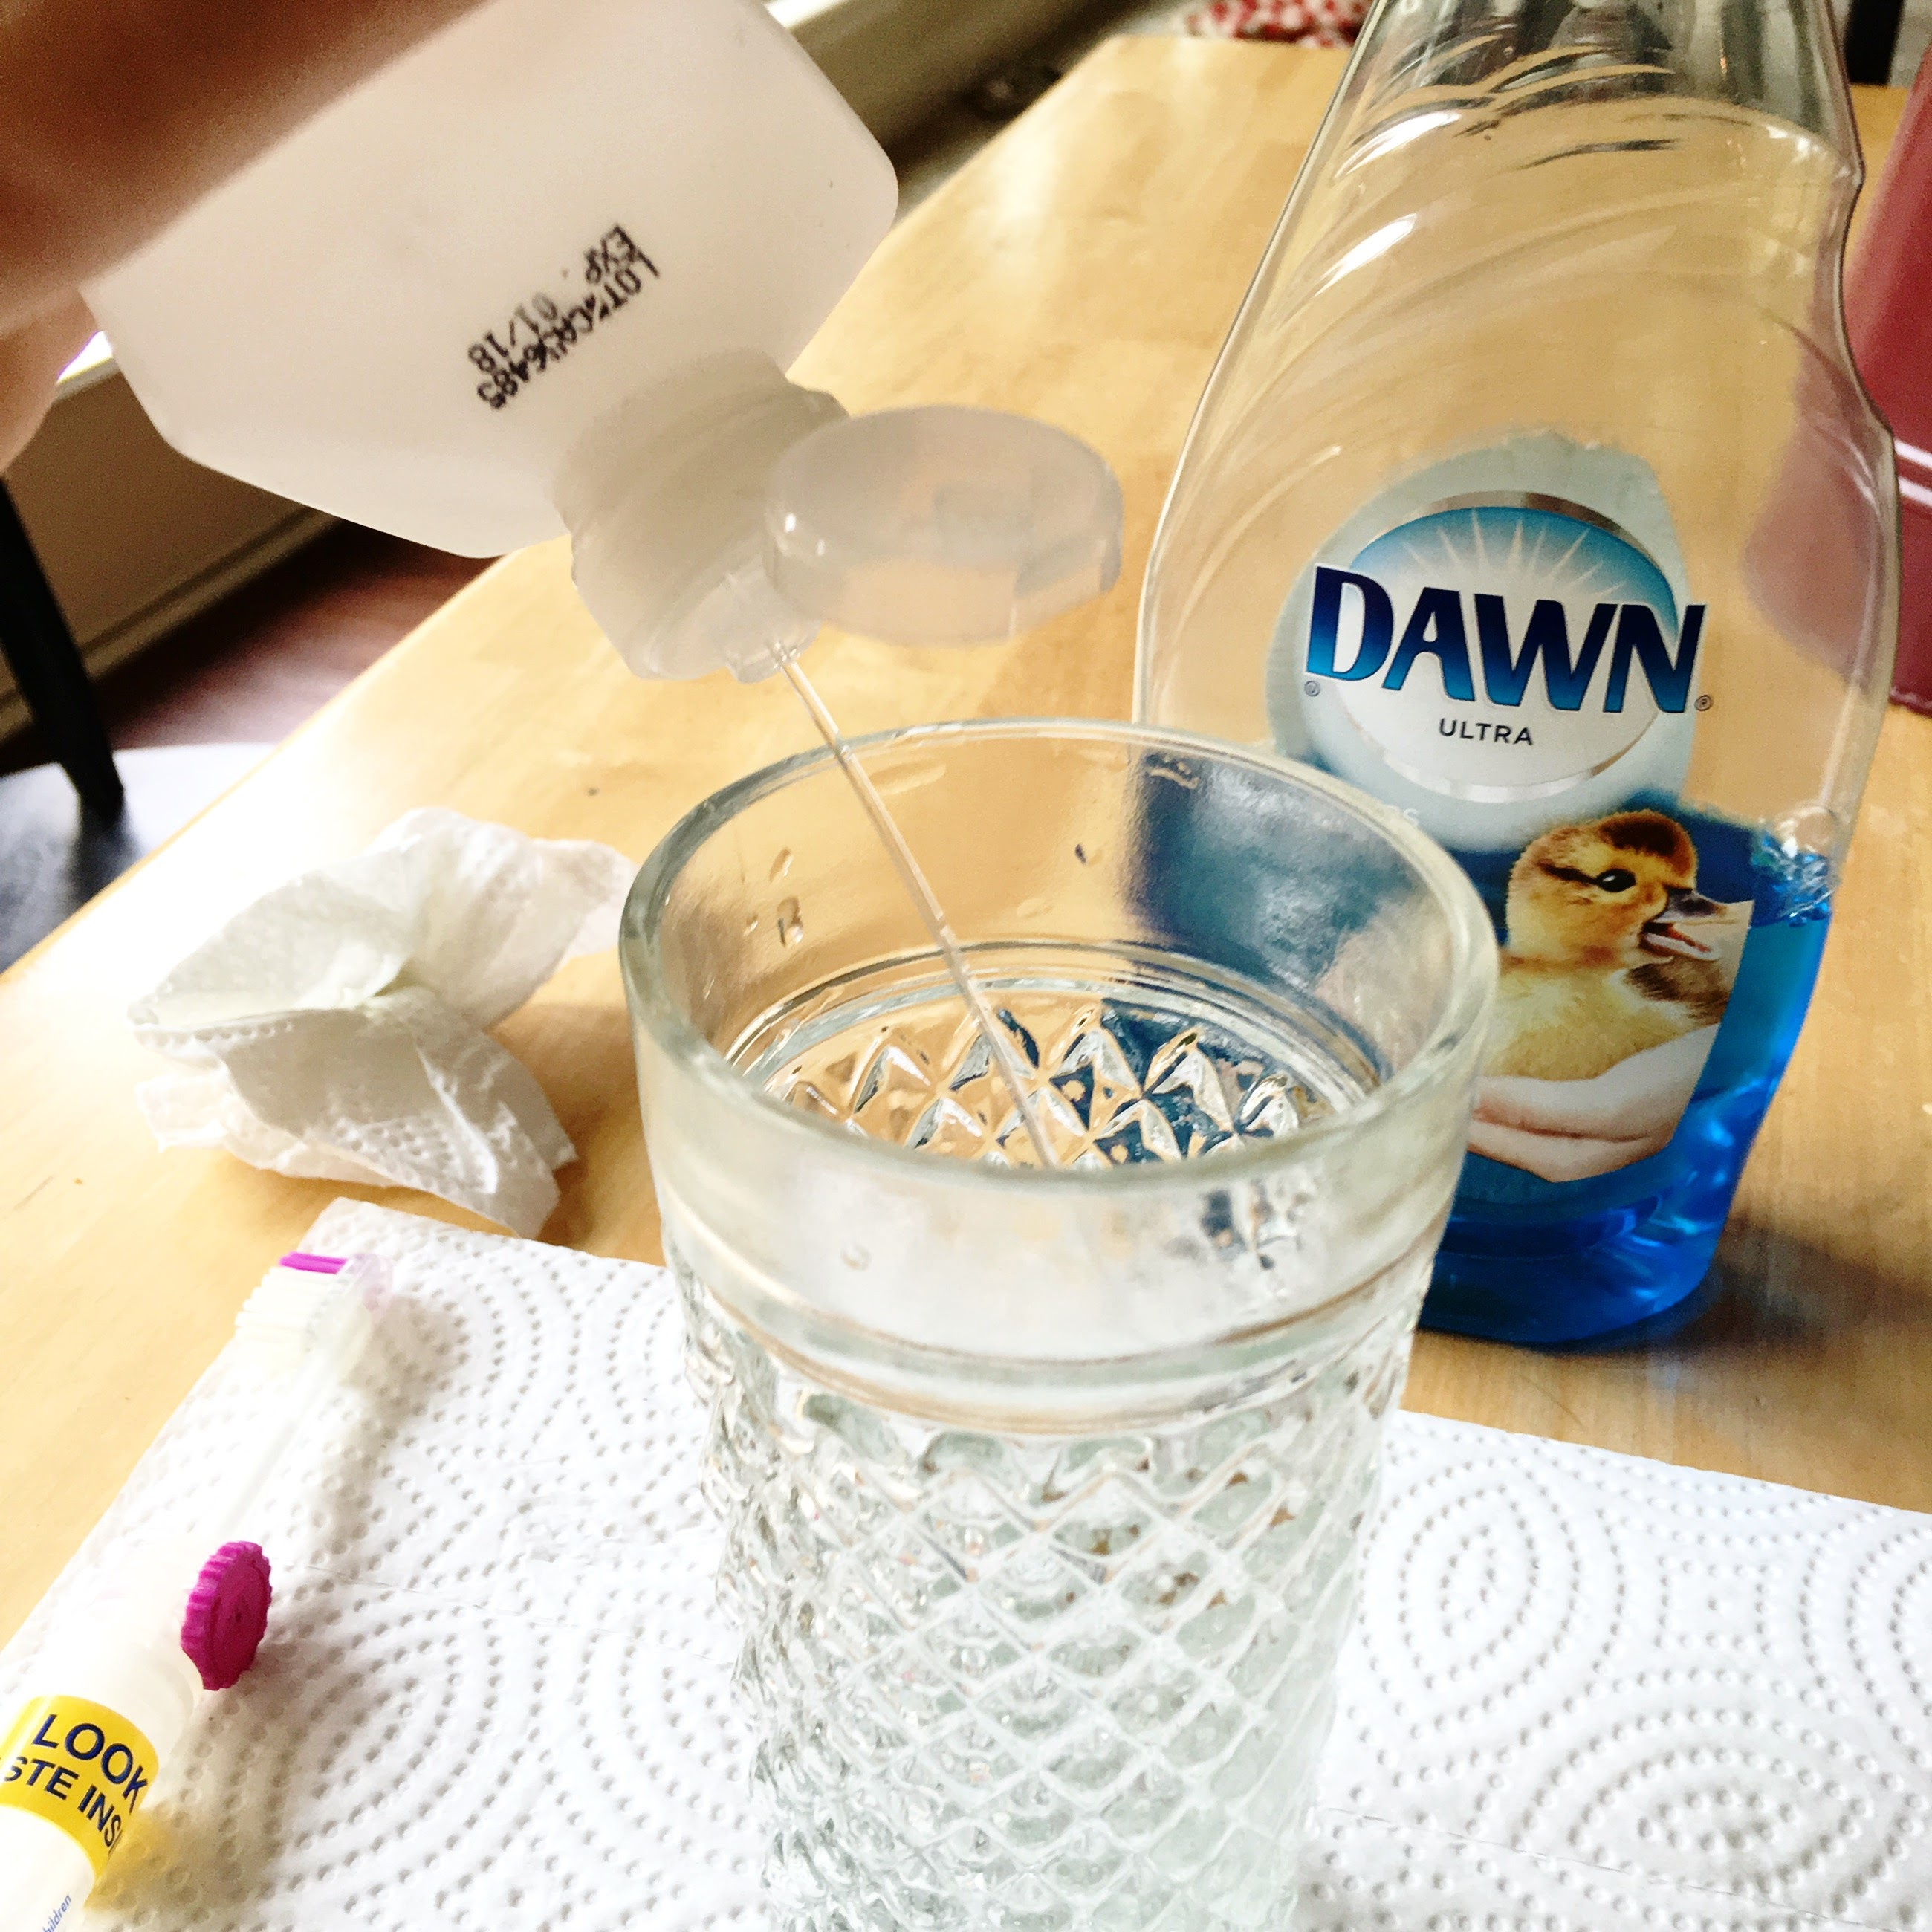 Hoe u uw trouwringen gemakkelijk schoon kunt maken Sieraden  verloving Toothbrush Soap Ring Hygiene Home Dishwashing liquid Dishwashing Cleaning products Chemical substances